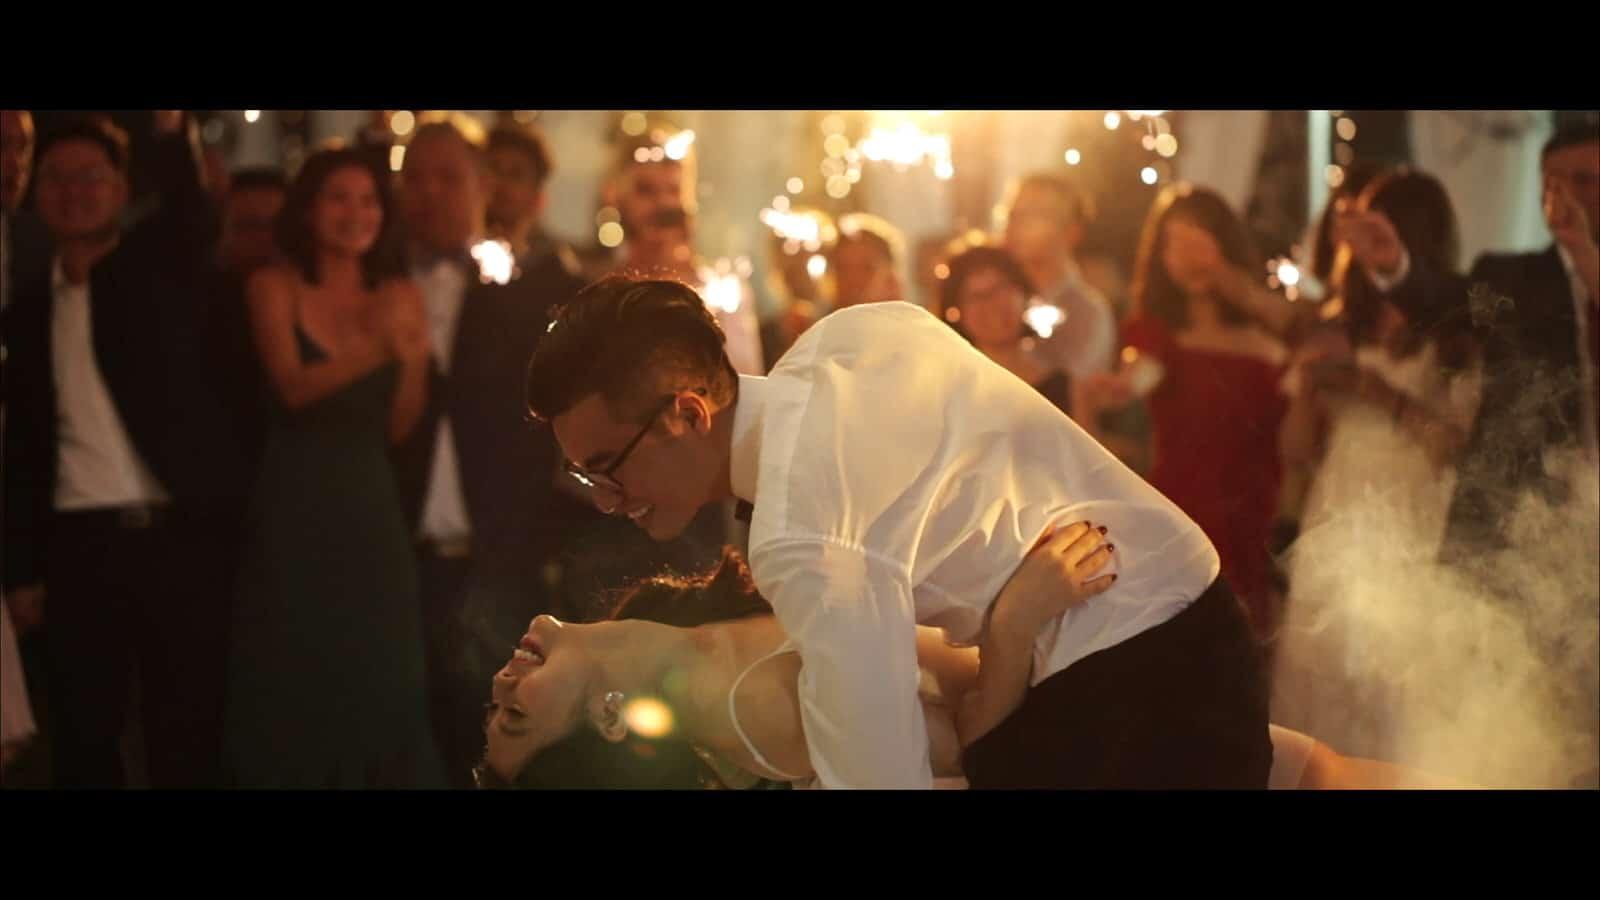 hung-milan-wedding-saigon